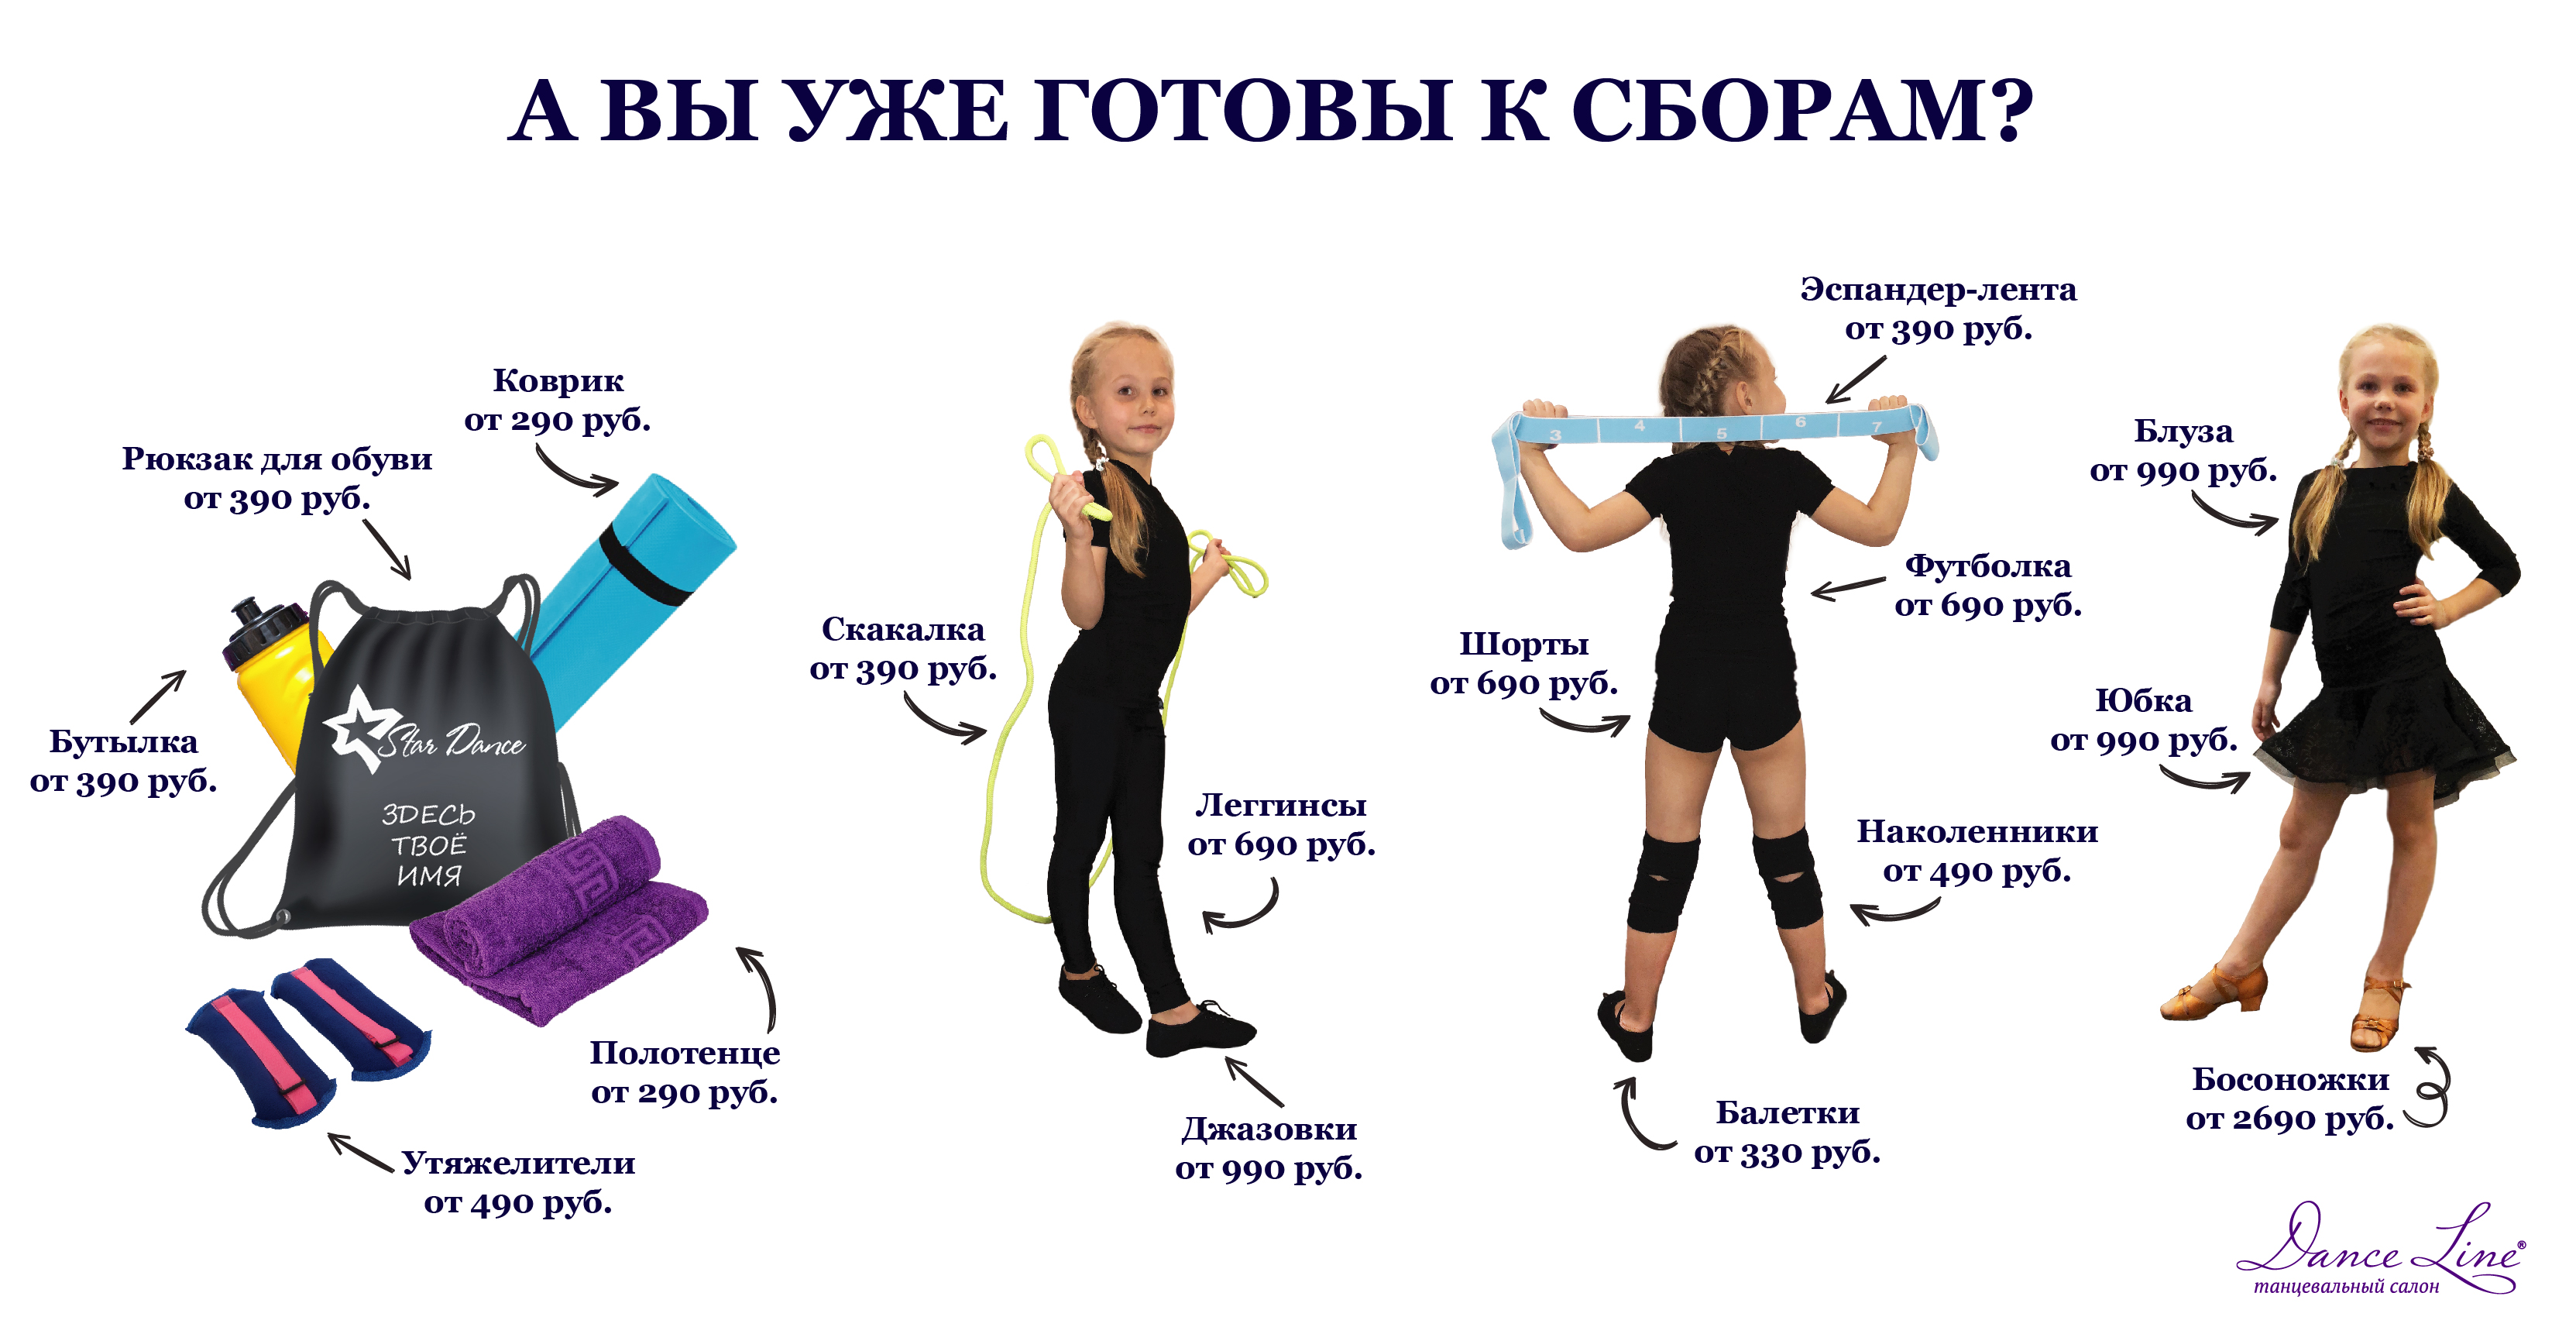 ПОДГОТОВКА К ЛЕТНИМ СБОРАМ 2018